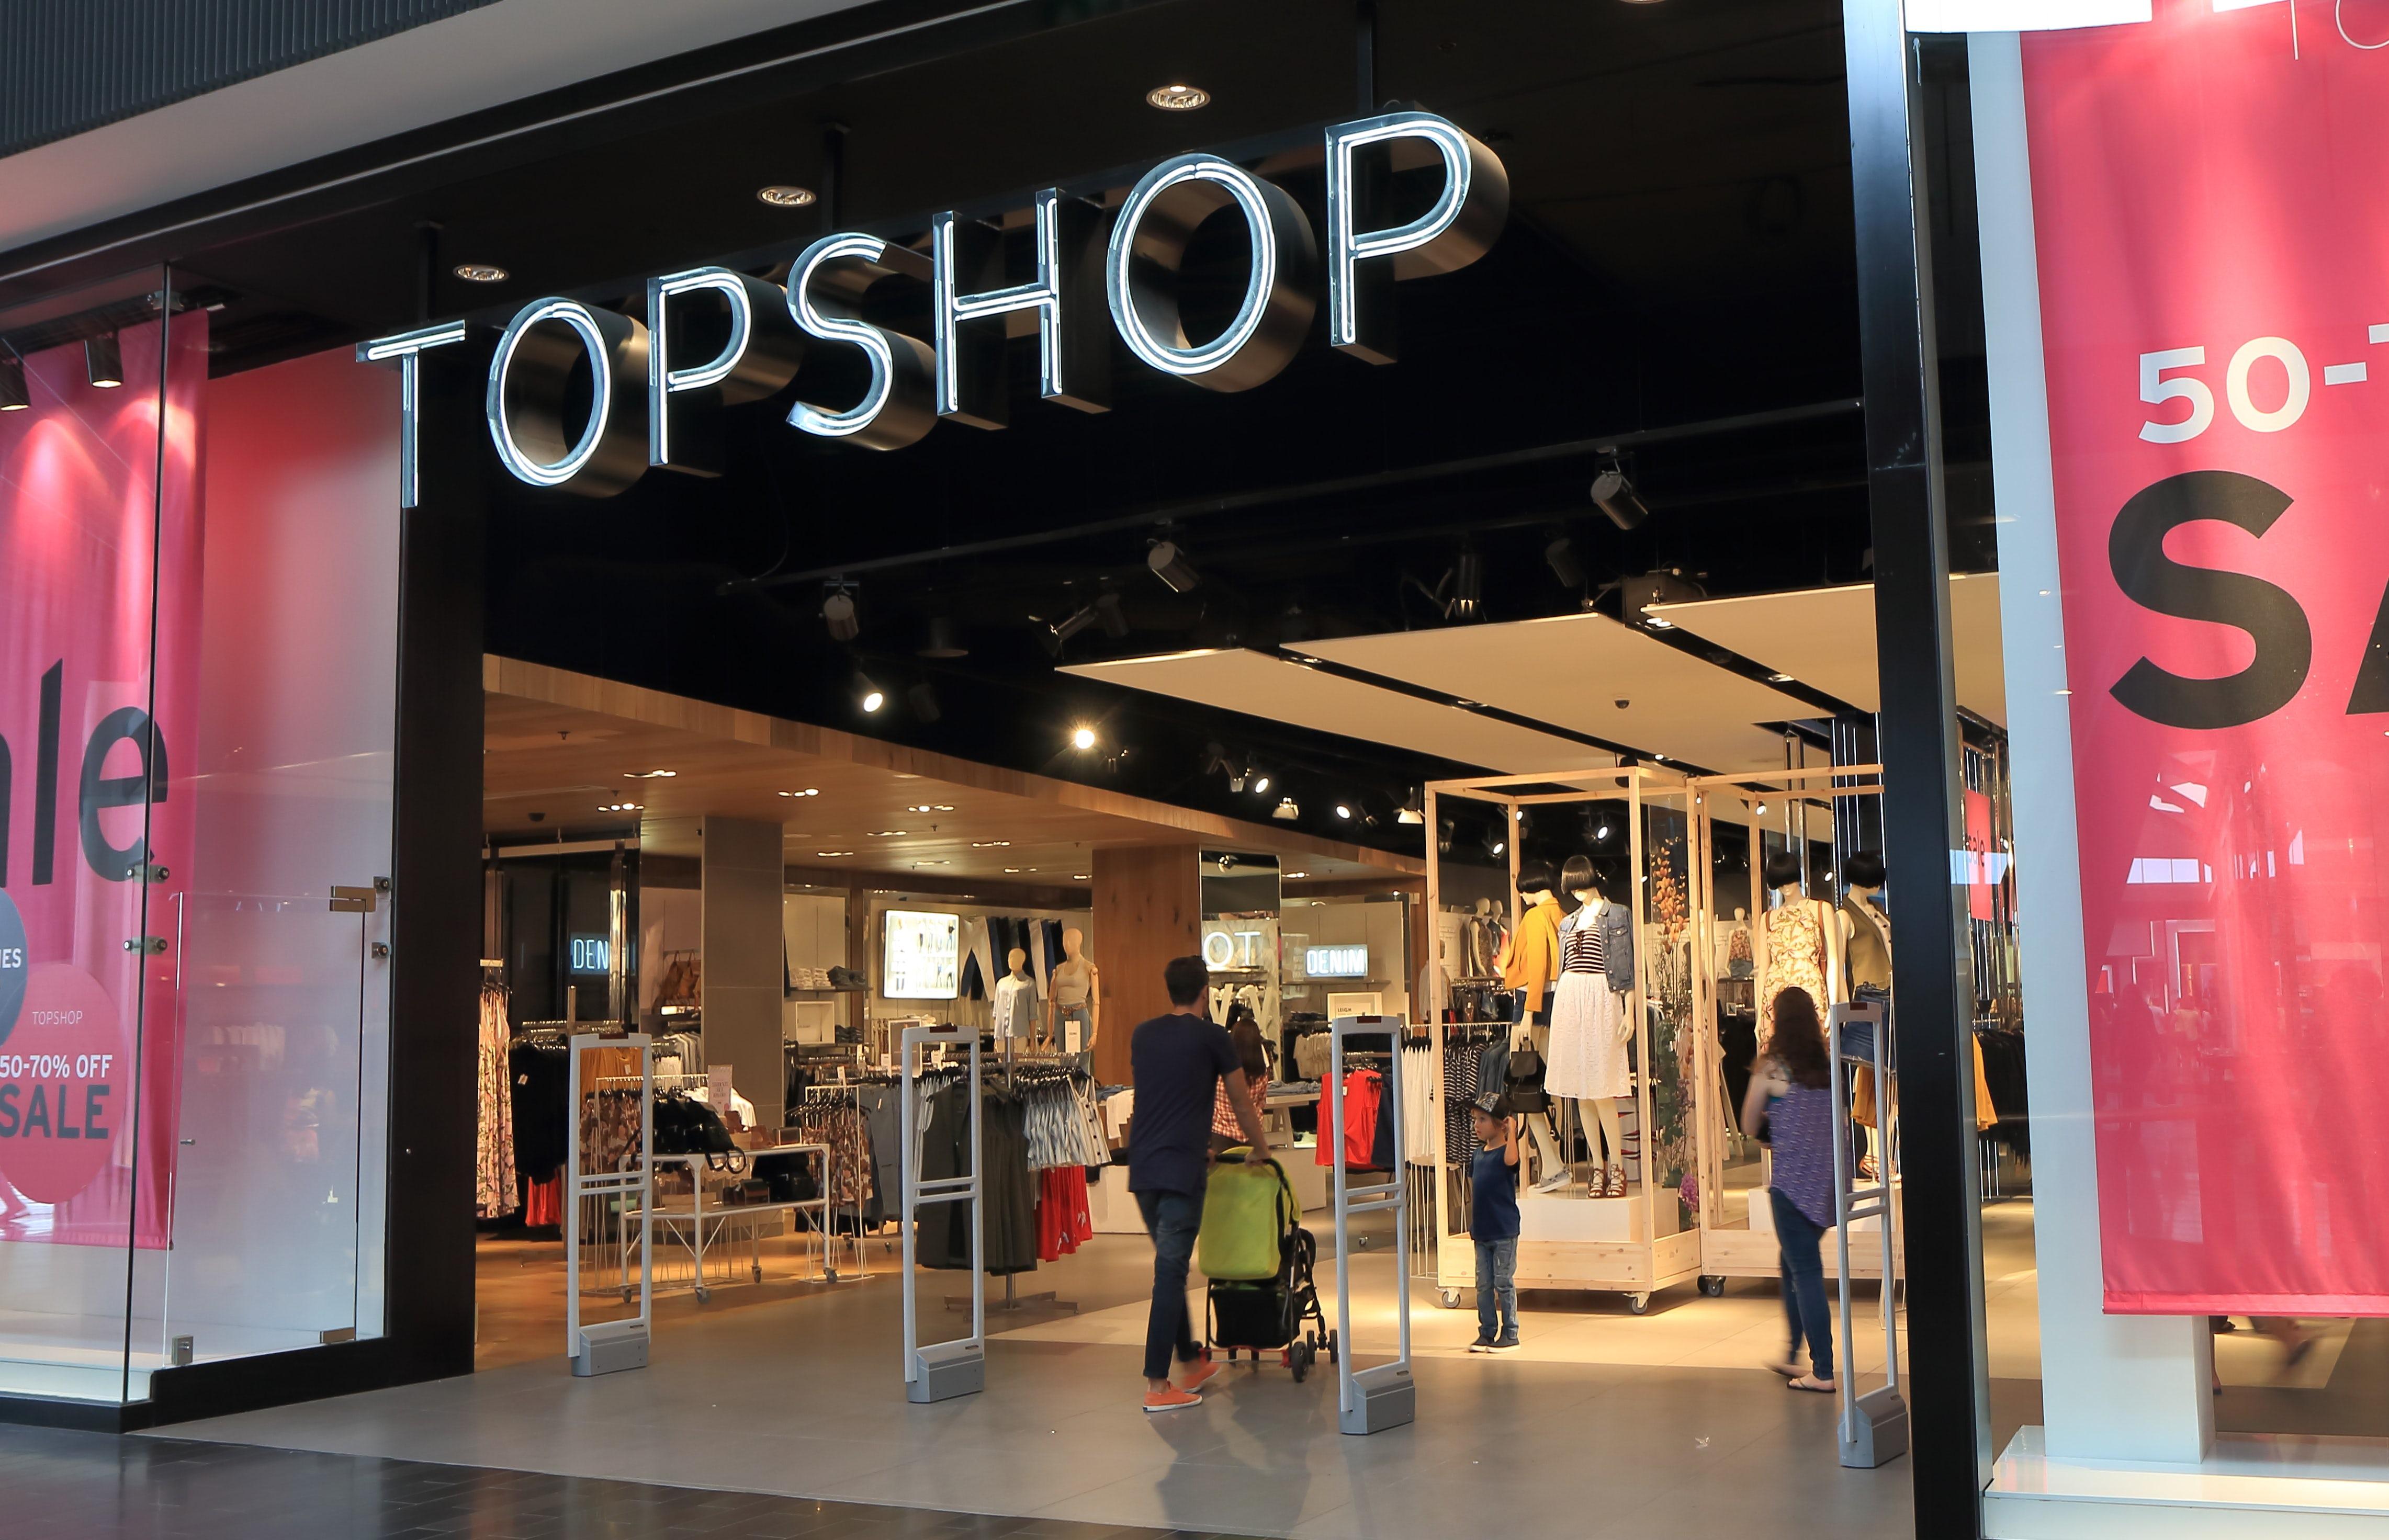 A Topshop store   Source: Shutterstock